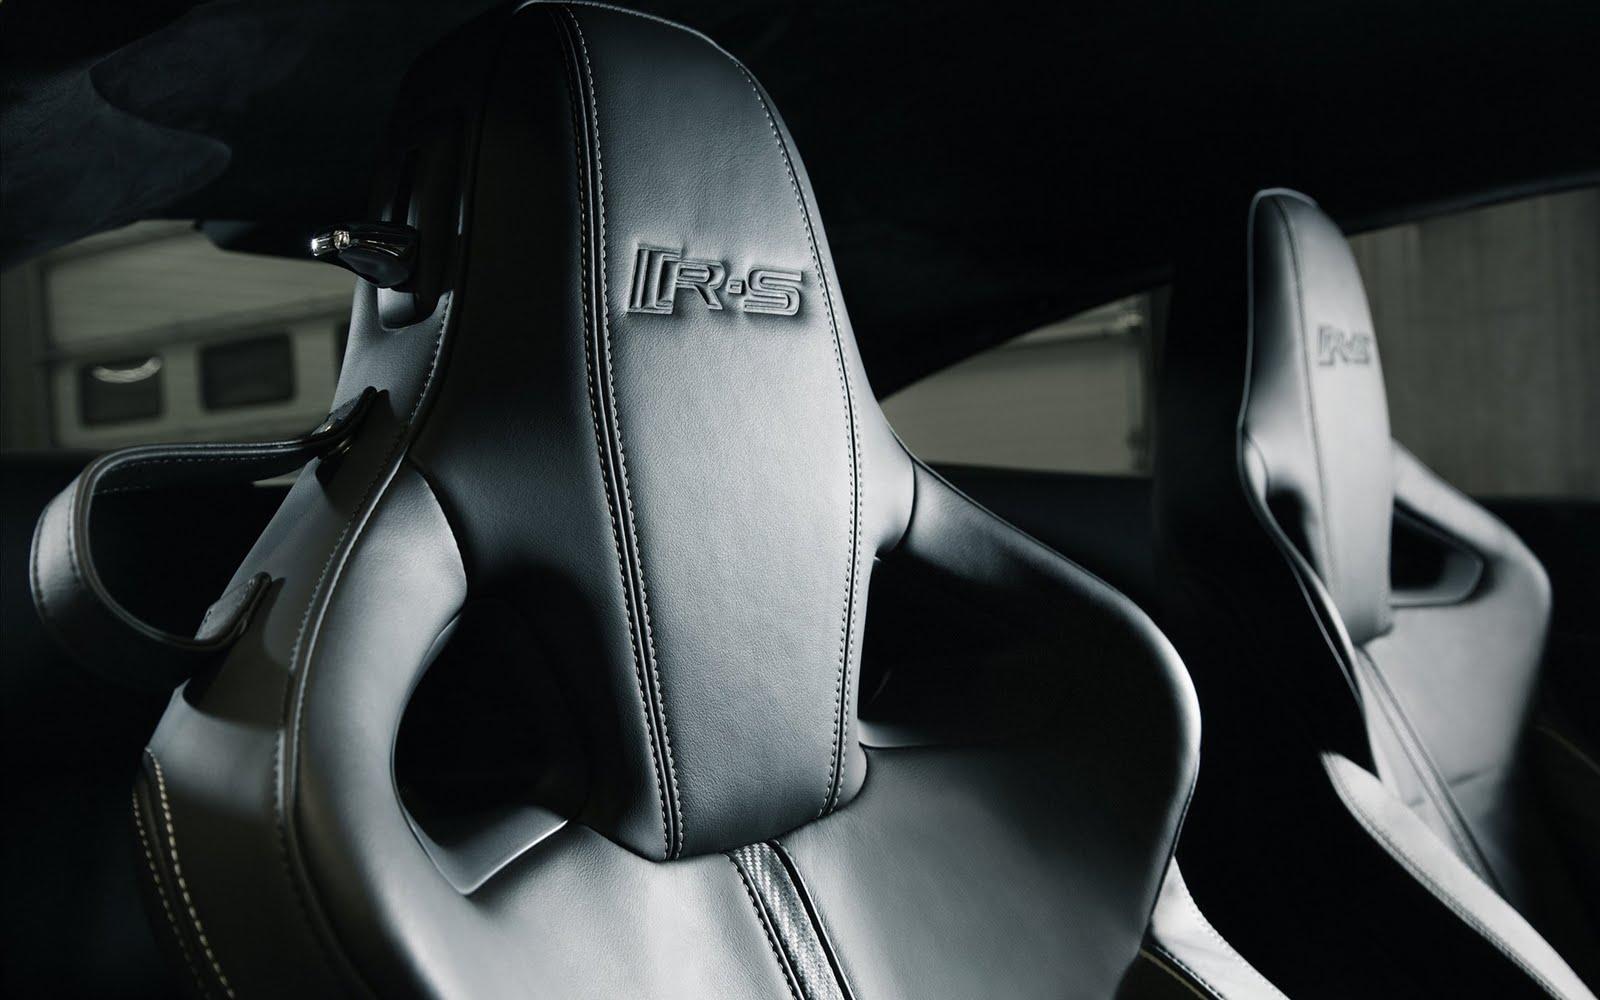 http://4.bp.blogspot.com/-KOM7uM1ysvA/TXGfa8MZZBI/AAAAAAAAF2U/IBvIj6Tw9UQ/s1600/Jaguar-XKR-S-2011-widescreen-11.jpg